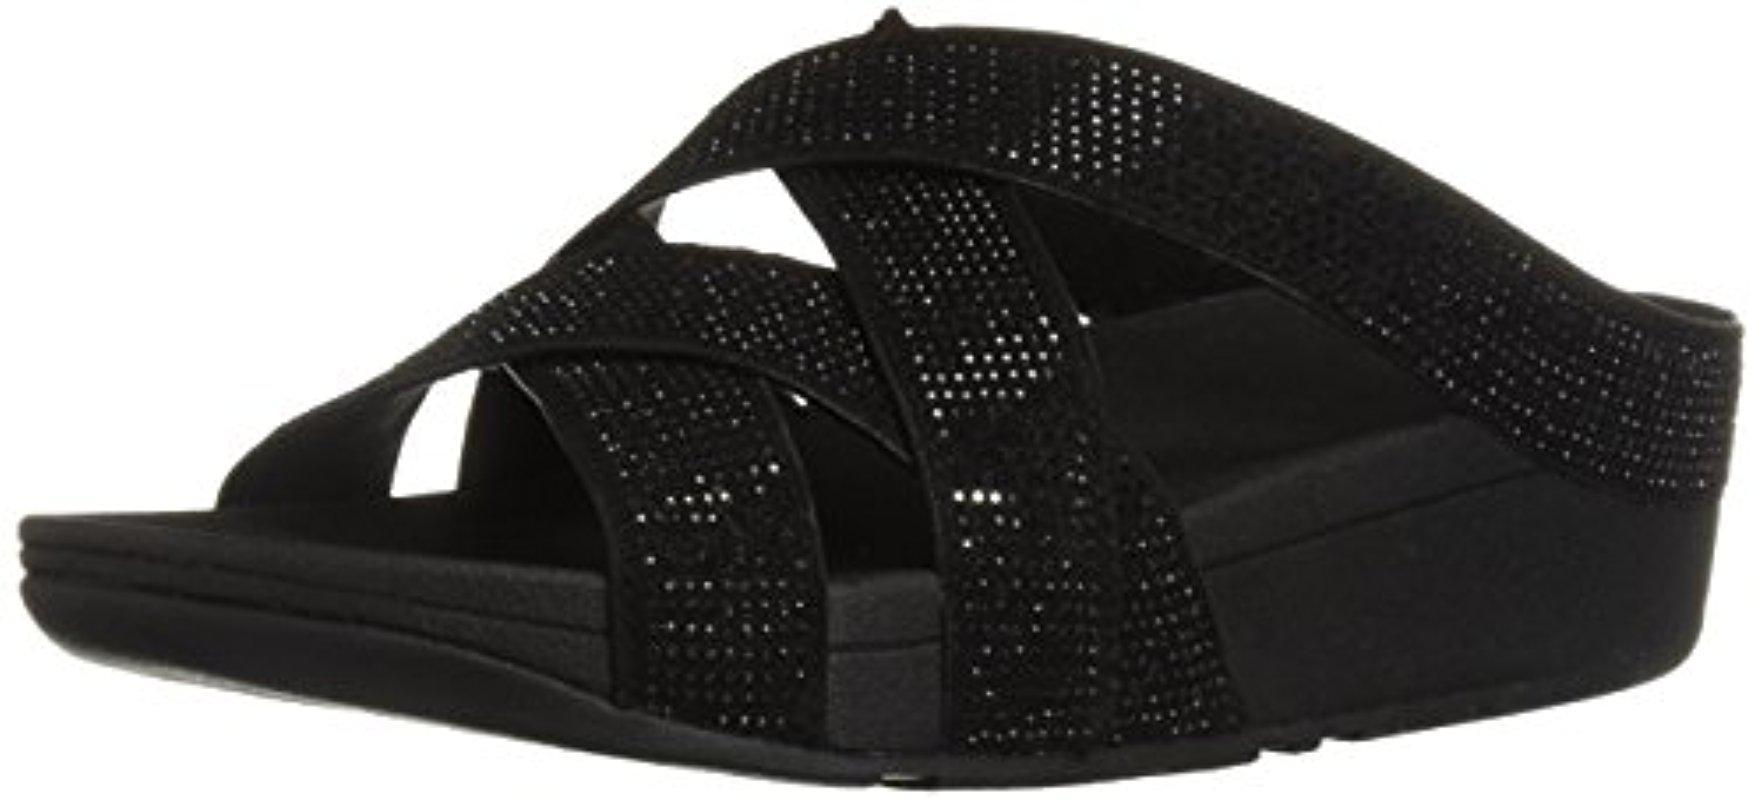 cdbc4459b0ca Lyst - Fitflop Slinky Rokkit Criss-cross Slide Sandal in Black